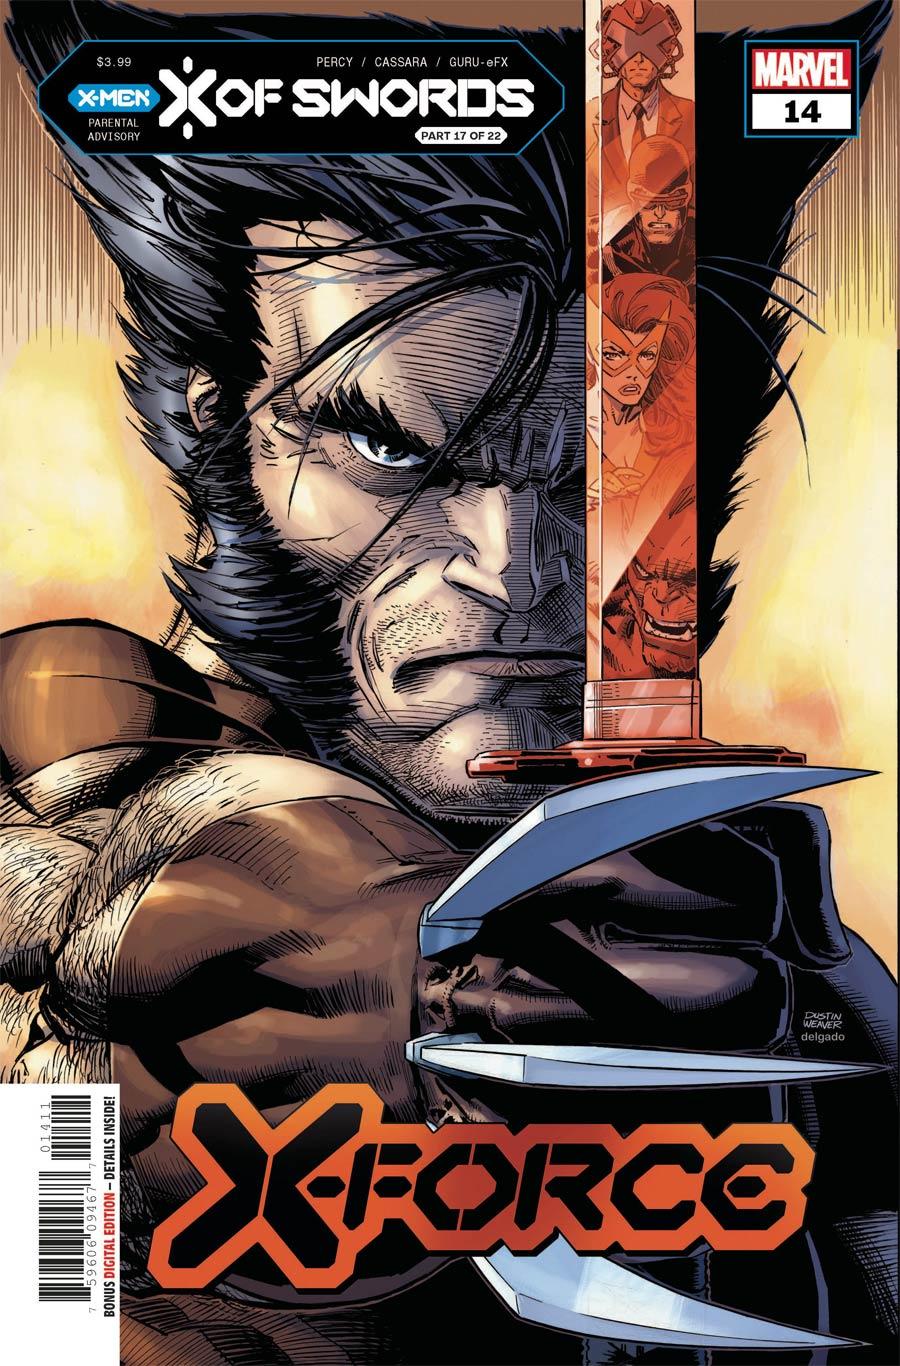 X-Force Vol 6 #14 Cover A Regular Dustin Weaver Cover (X Of Swords Part 17)